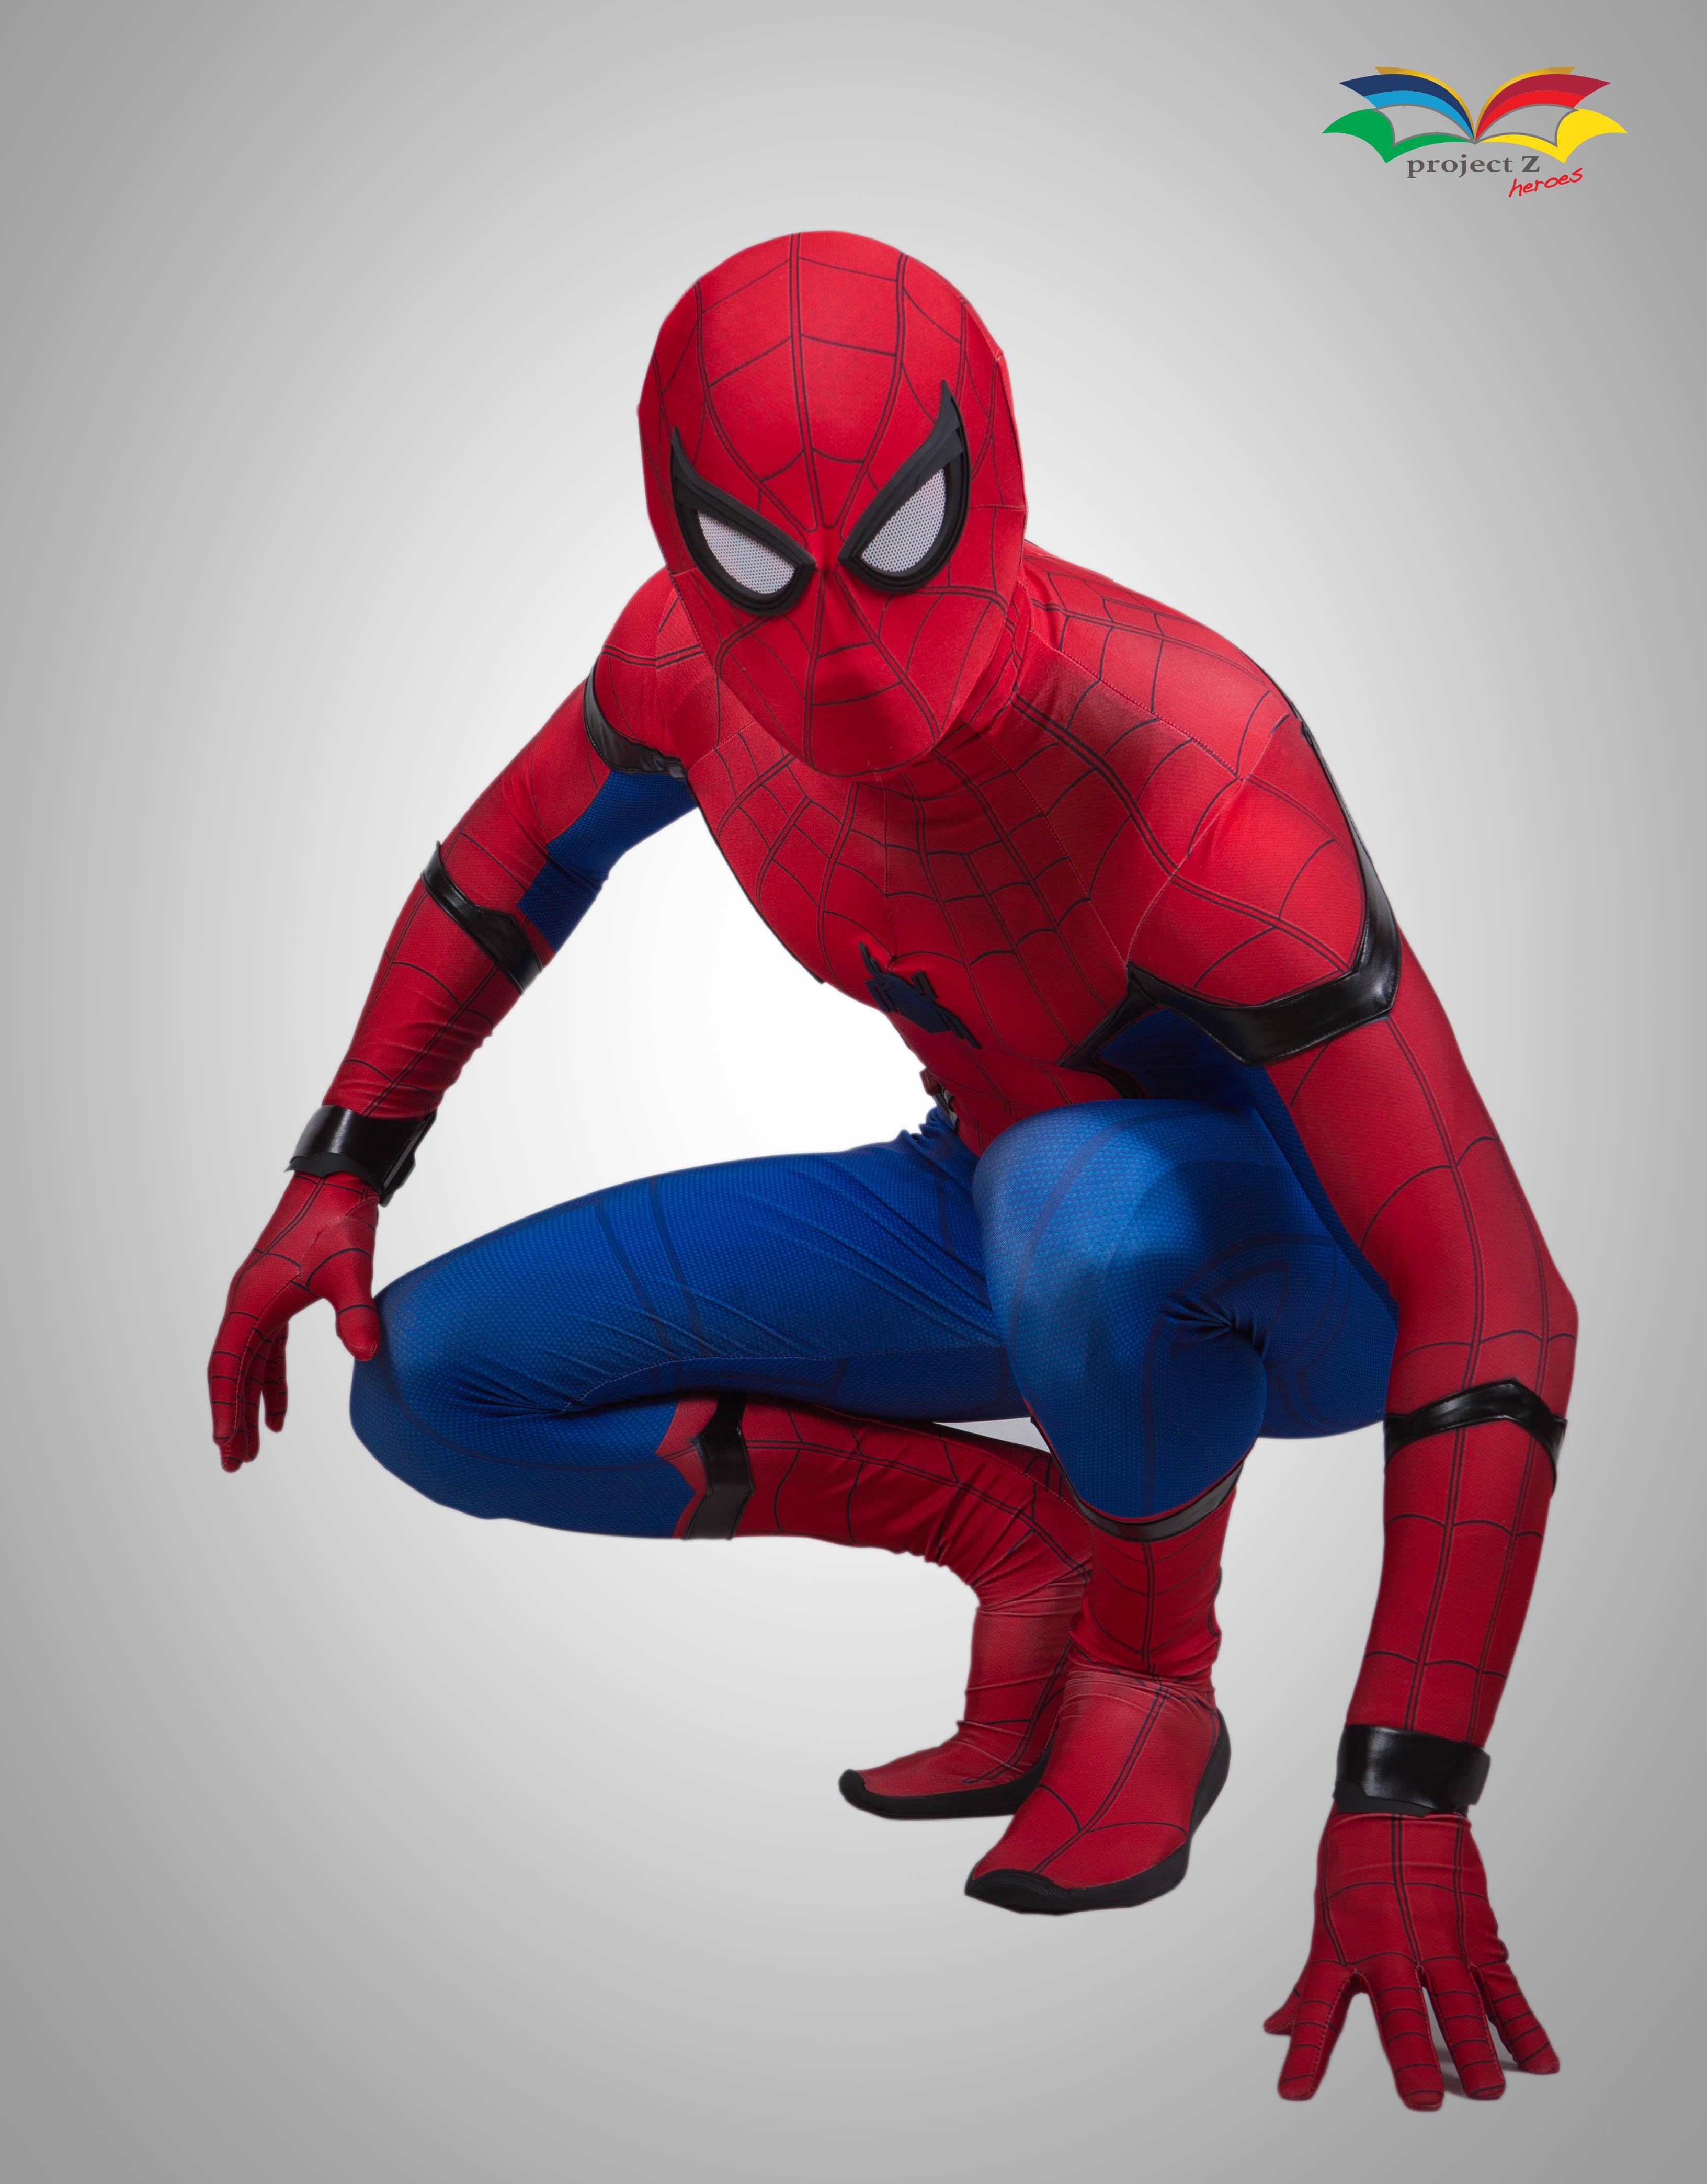 Spiderman homecoming costume sitting post